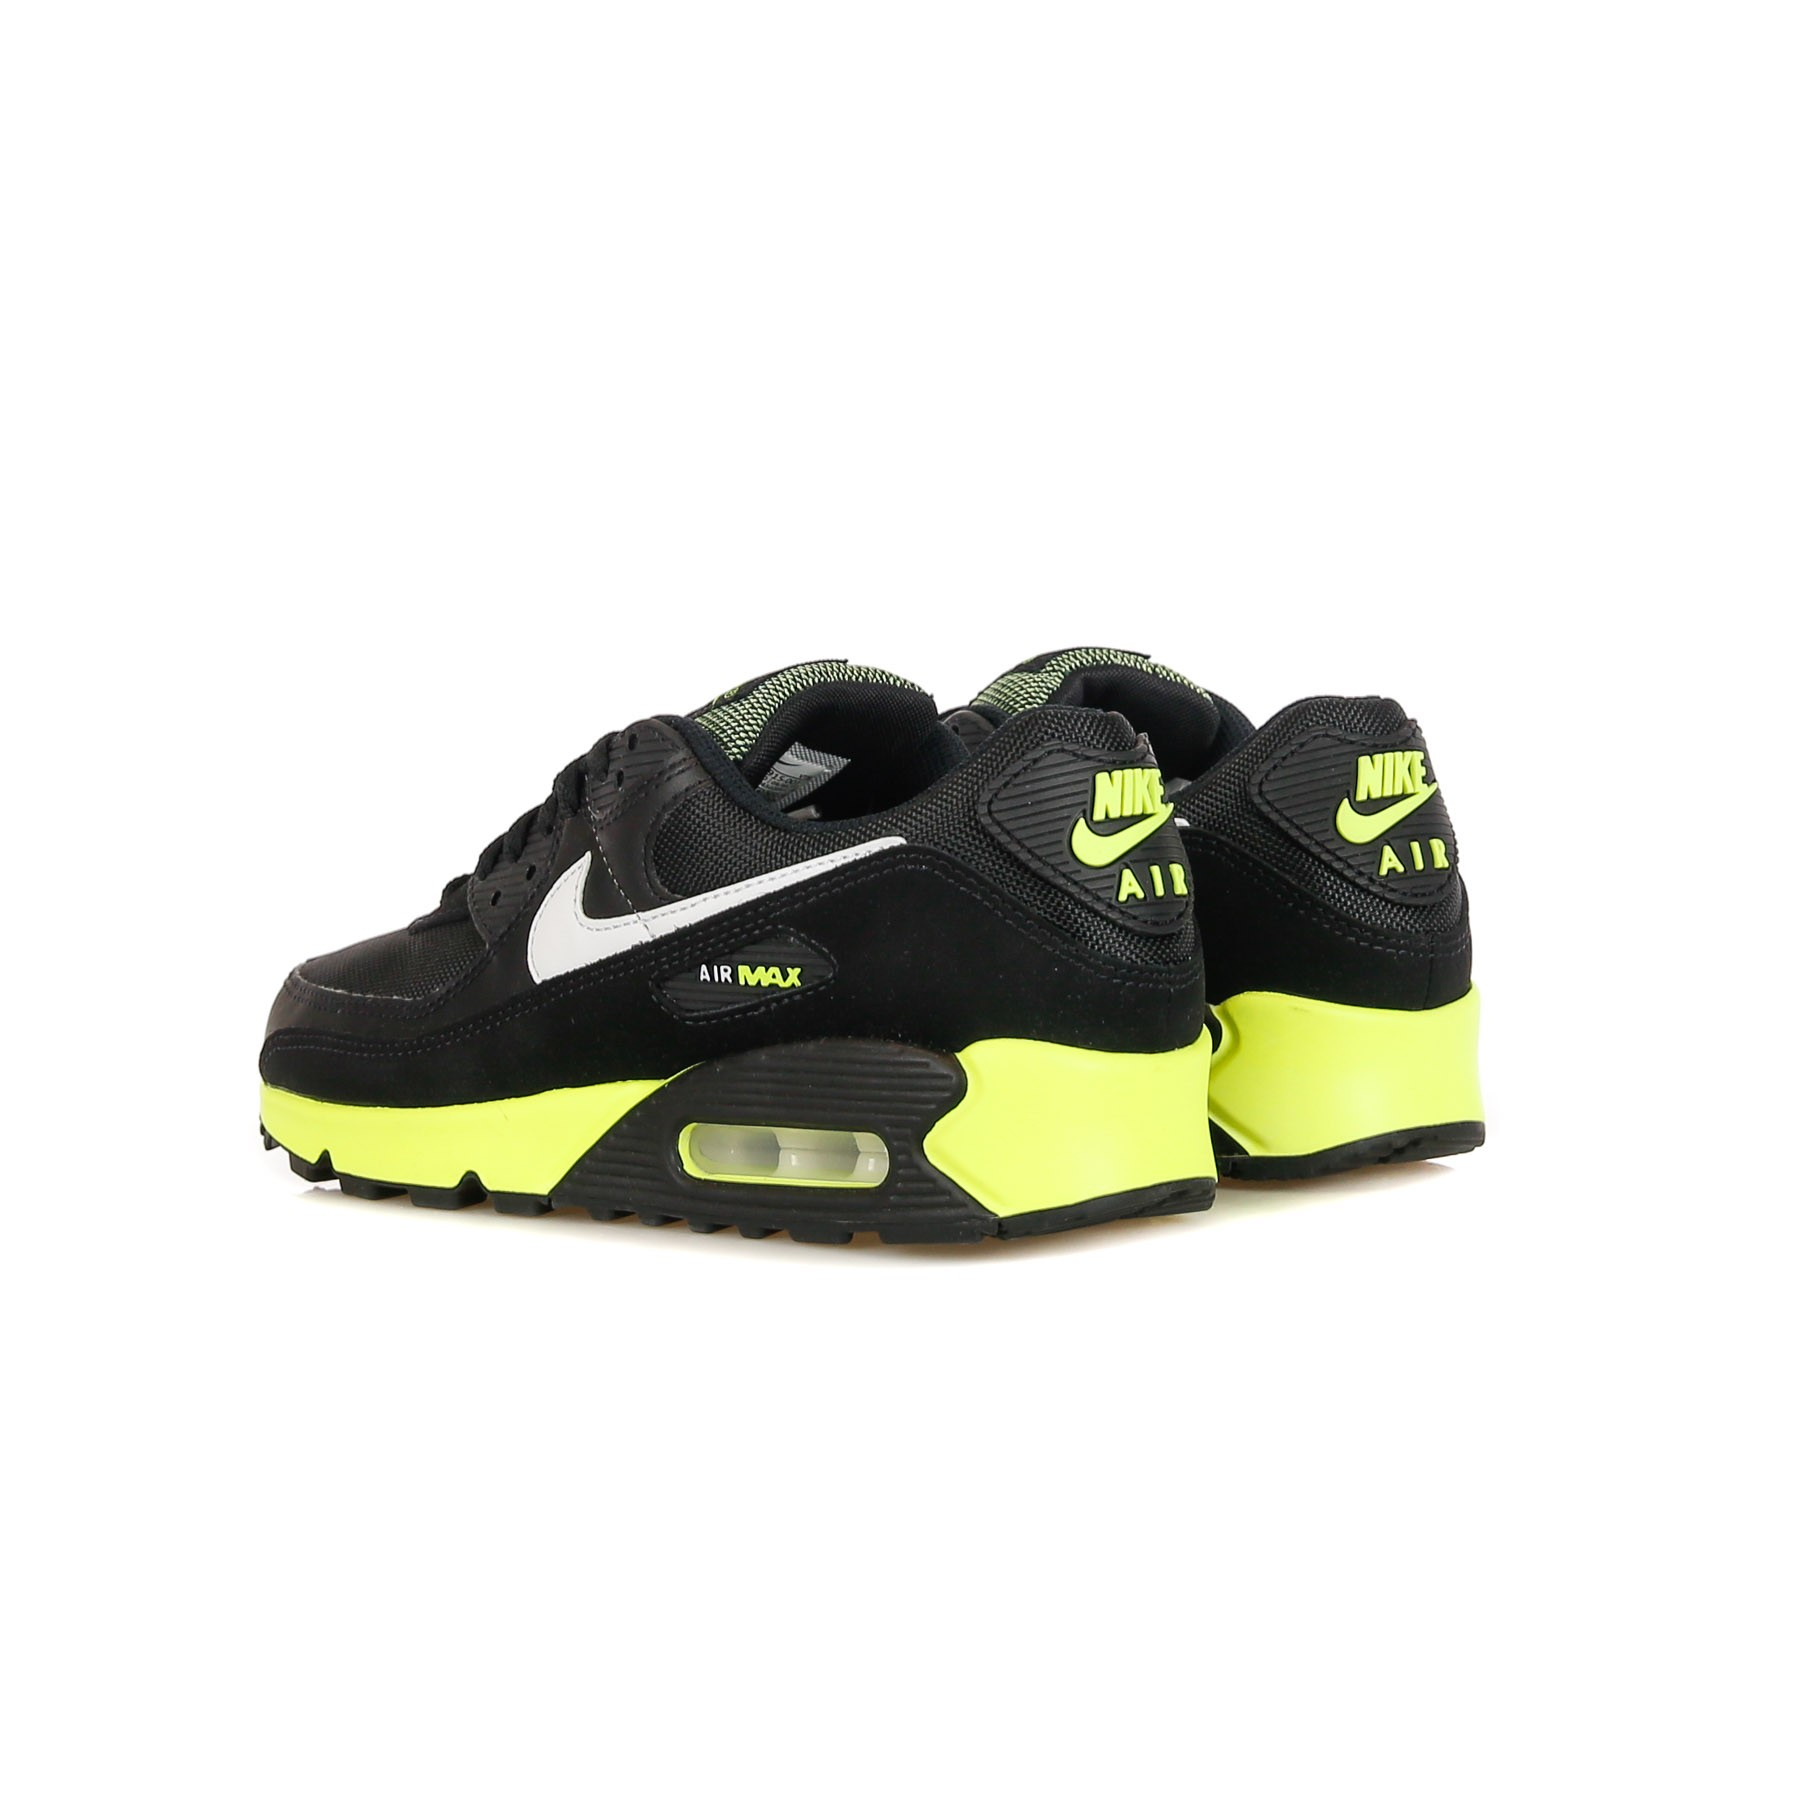 Nike Scarpa bassa uomo air max 90 DB3915-001   Atipicishop.com